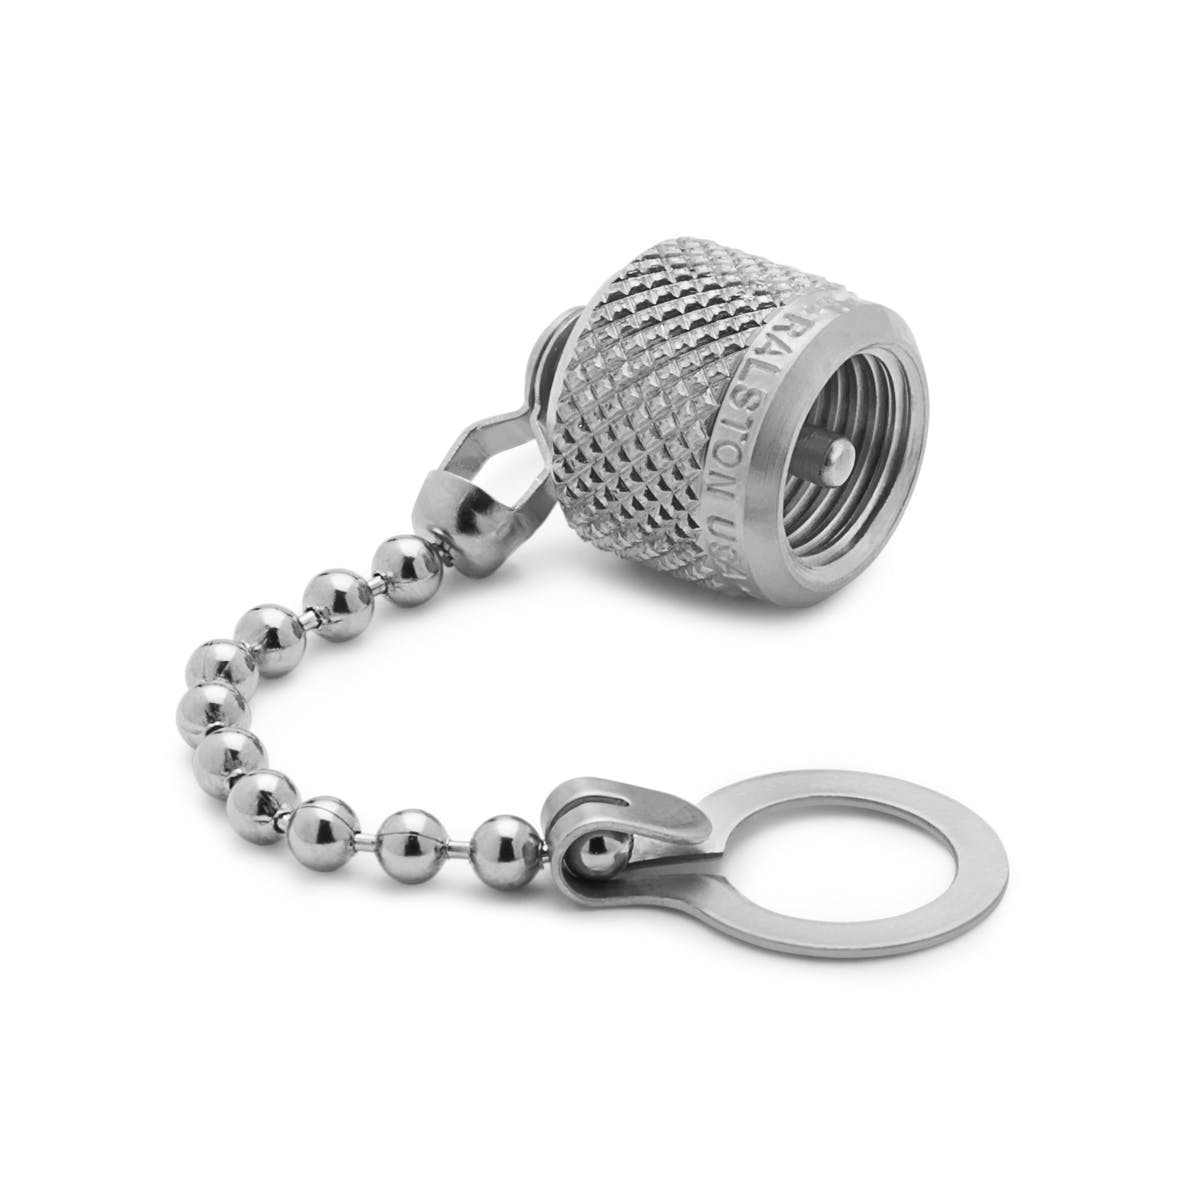 Qtft Cap & Chain